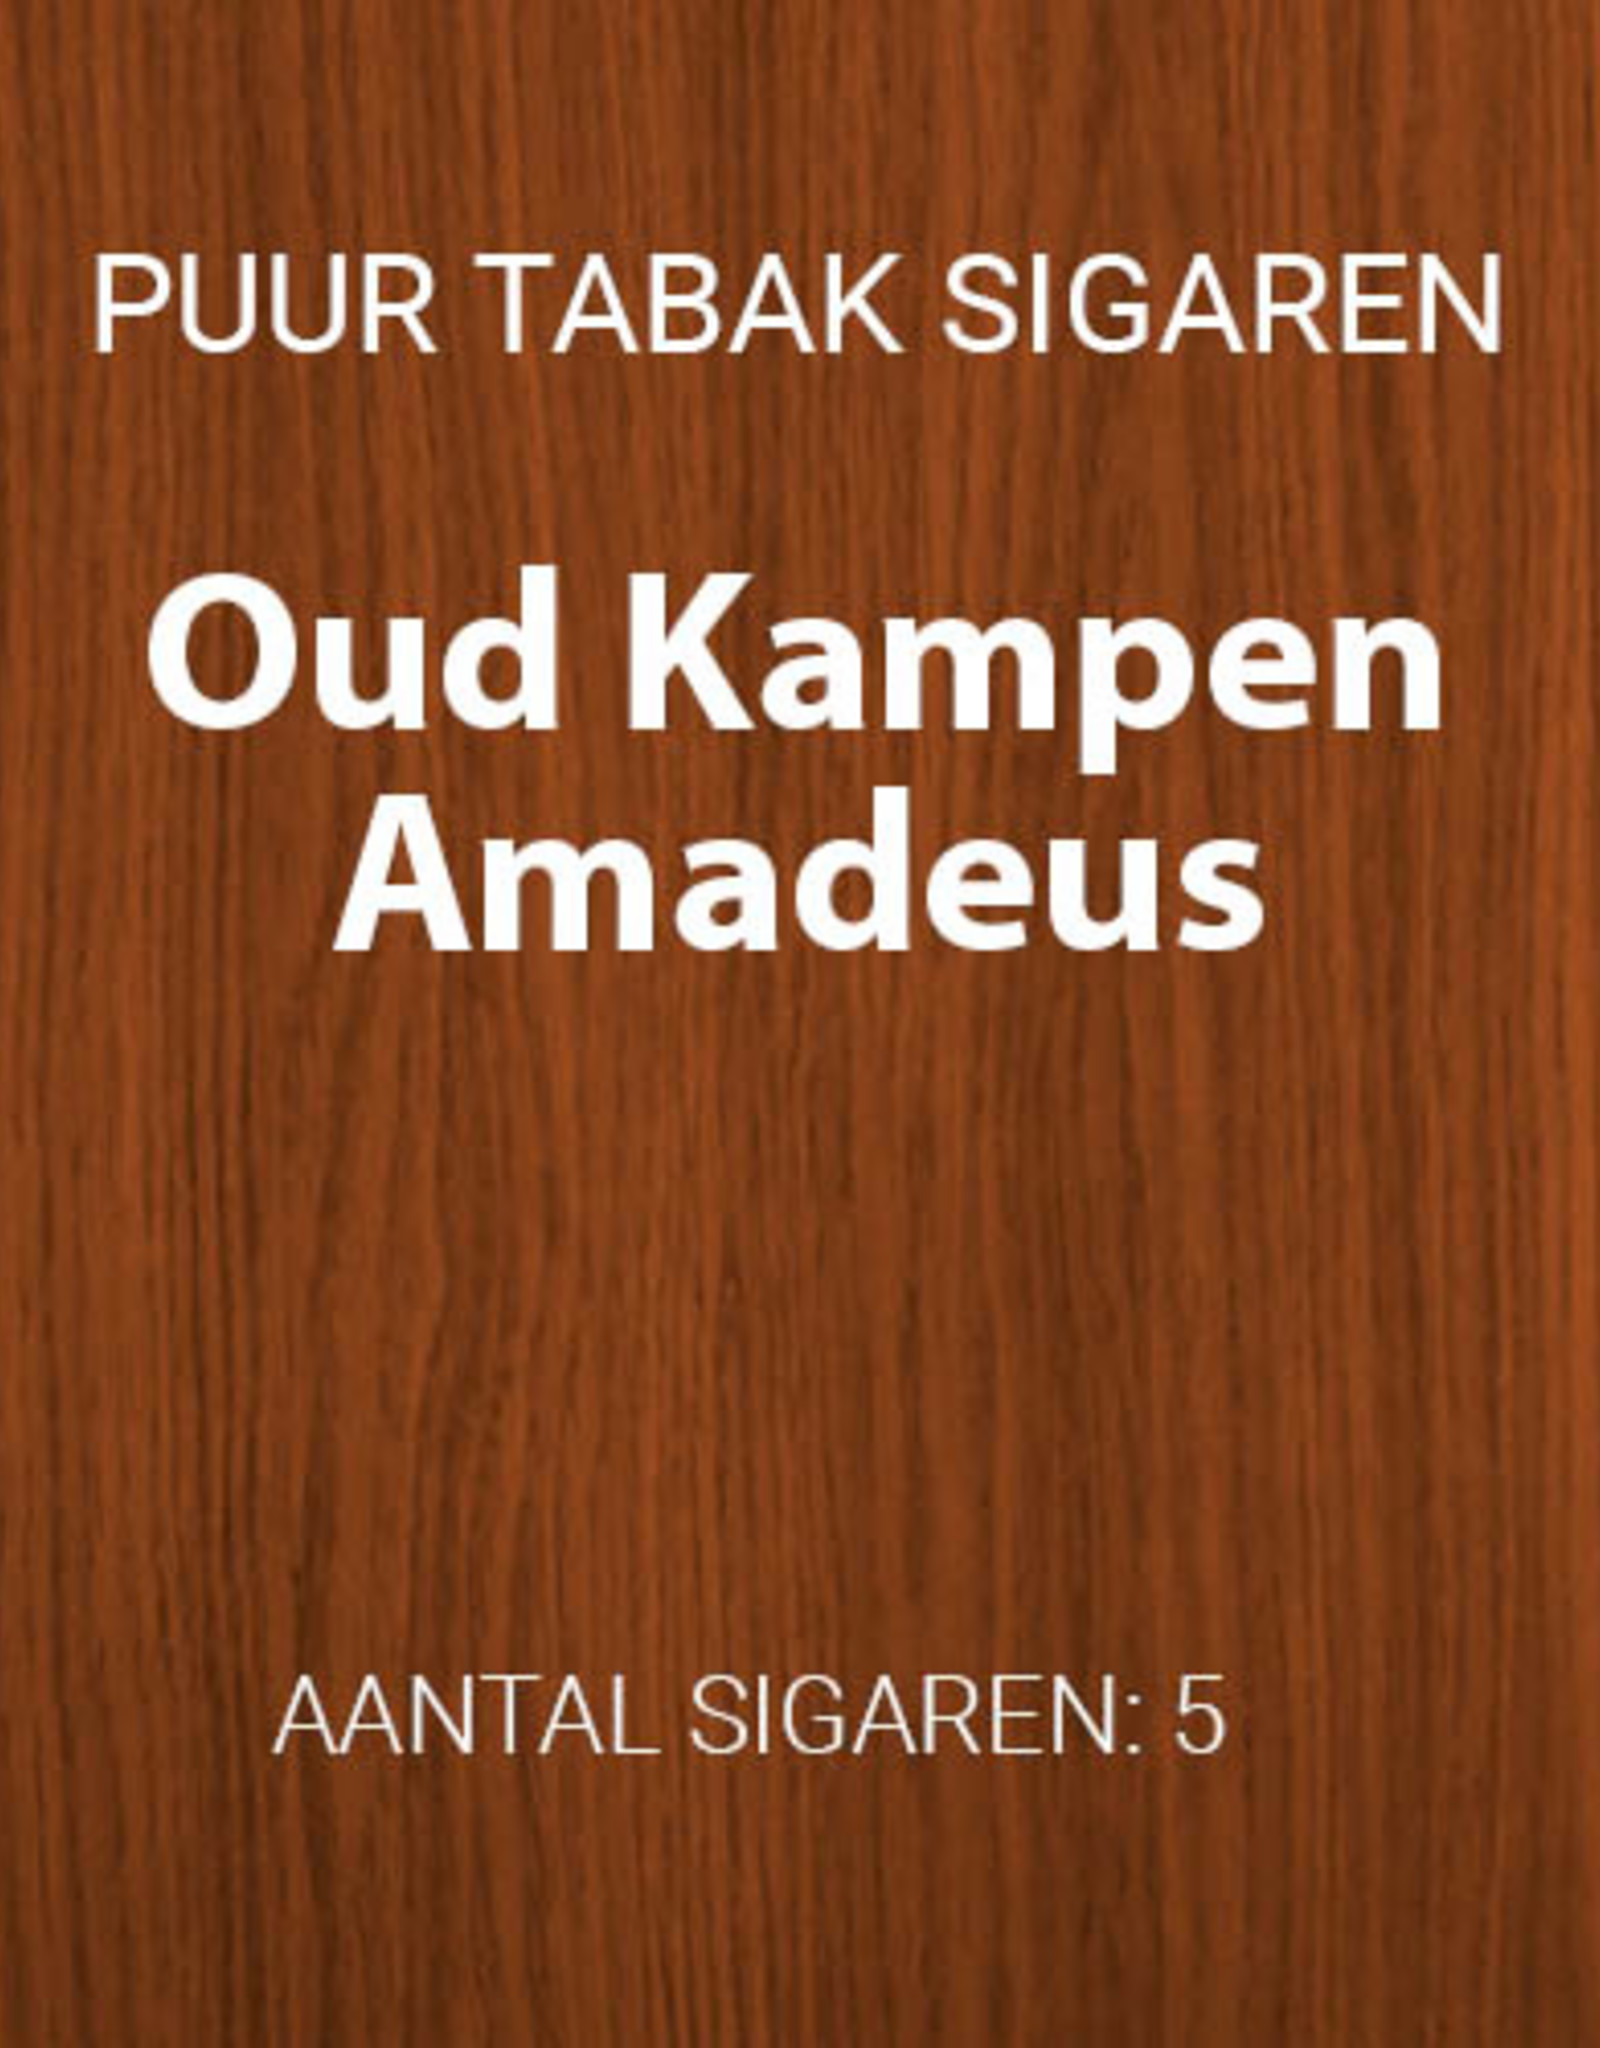 Oud Kampen Oud Kampen Amadeus 5 stuks